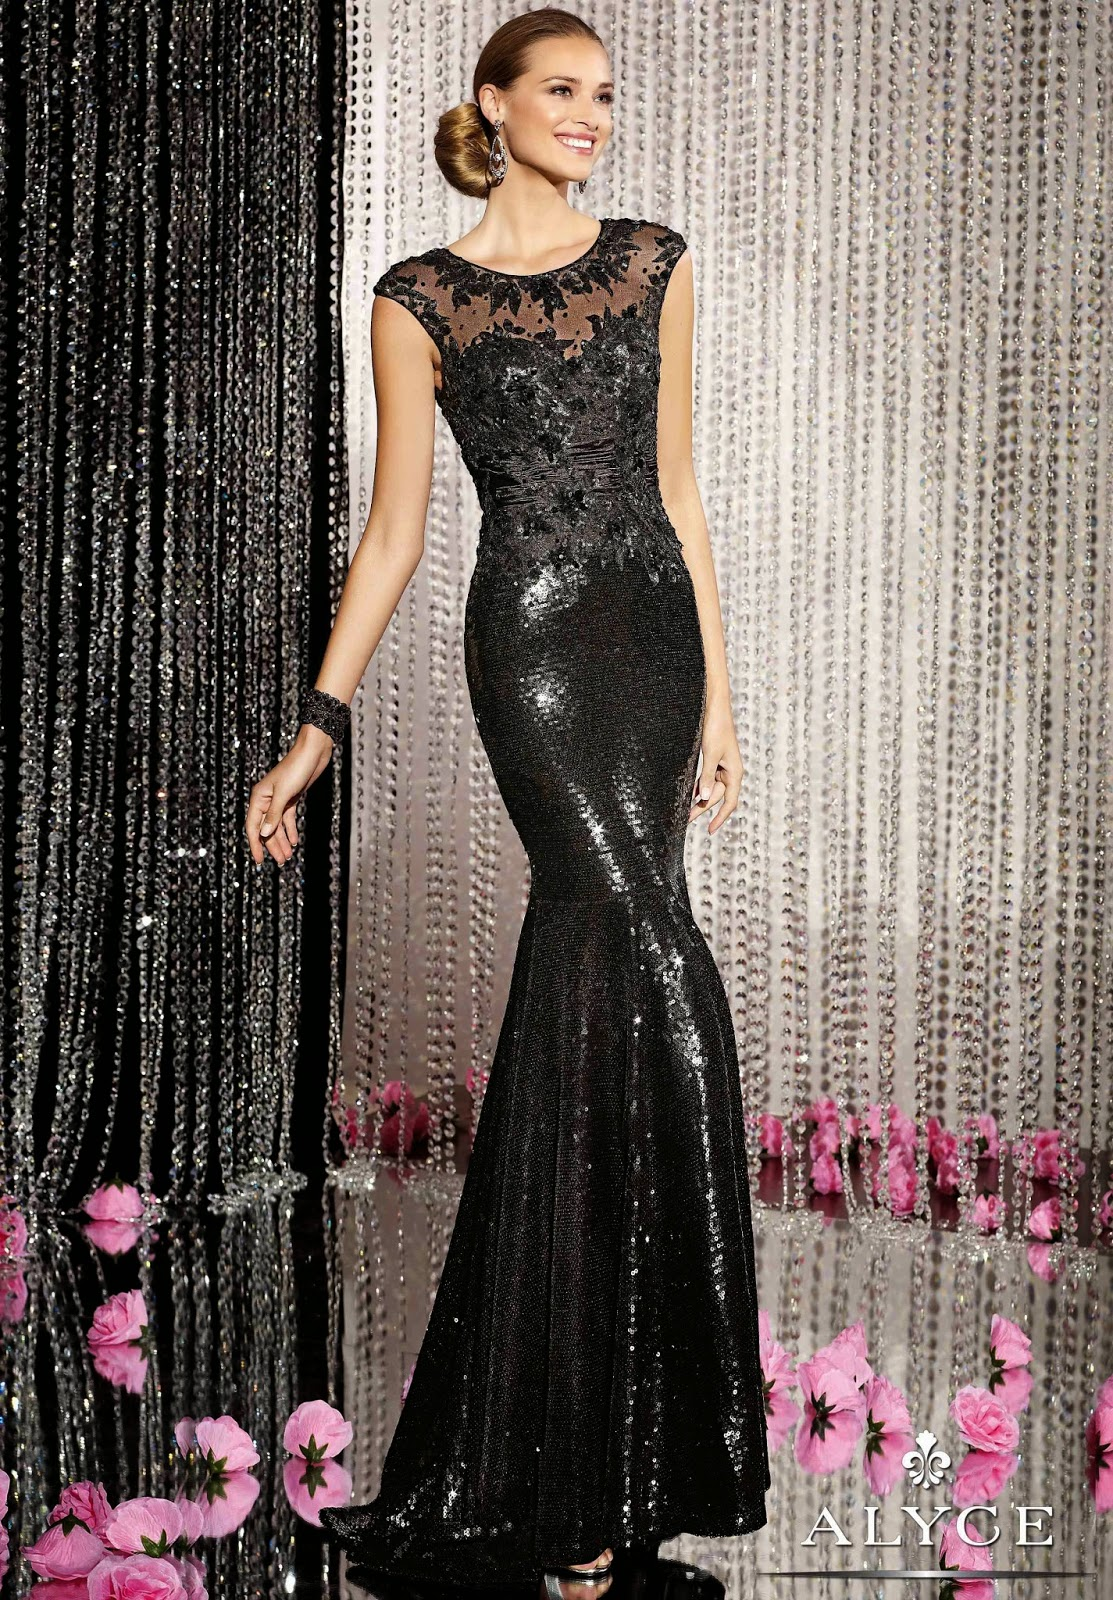 Alyce Wedding Dresses 56 Fresh  series are amazing